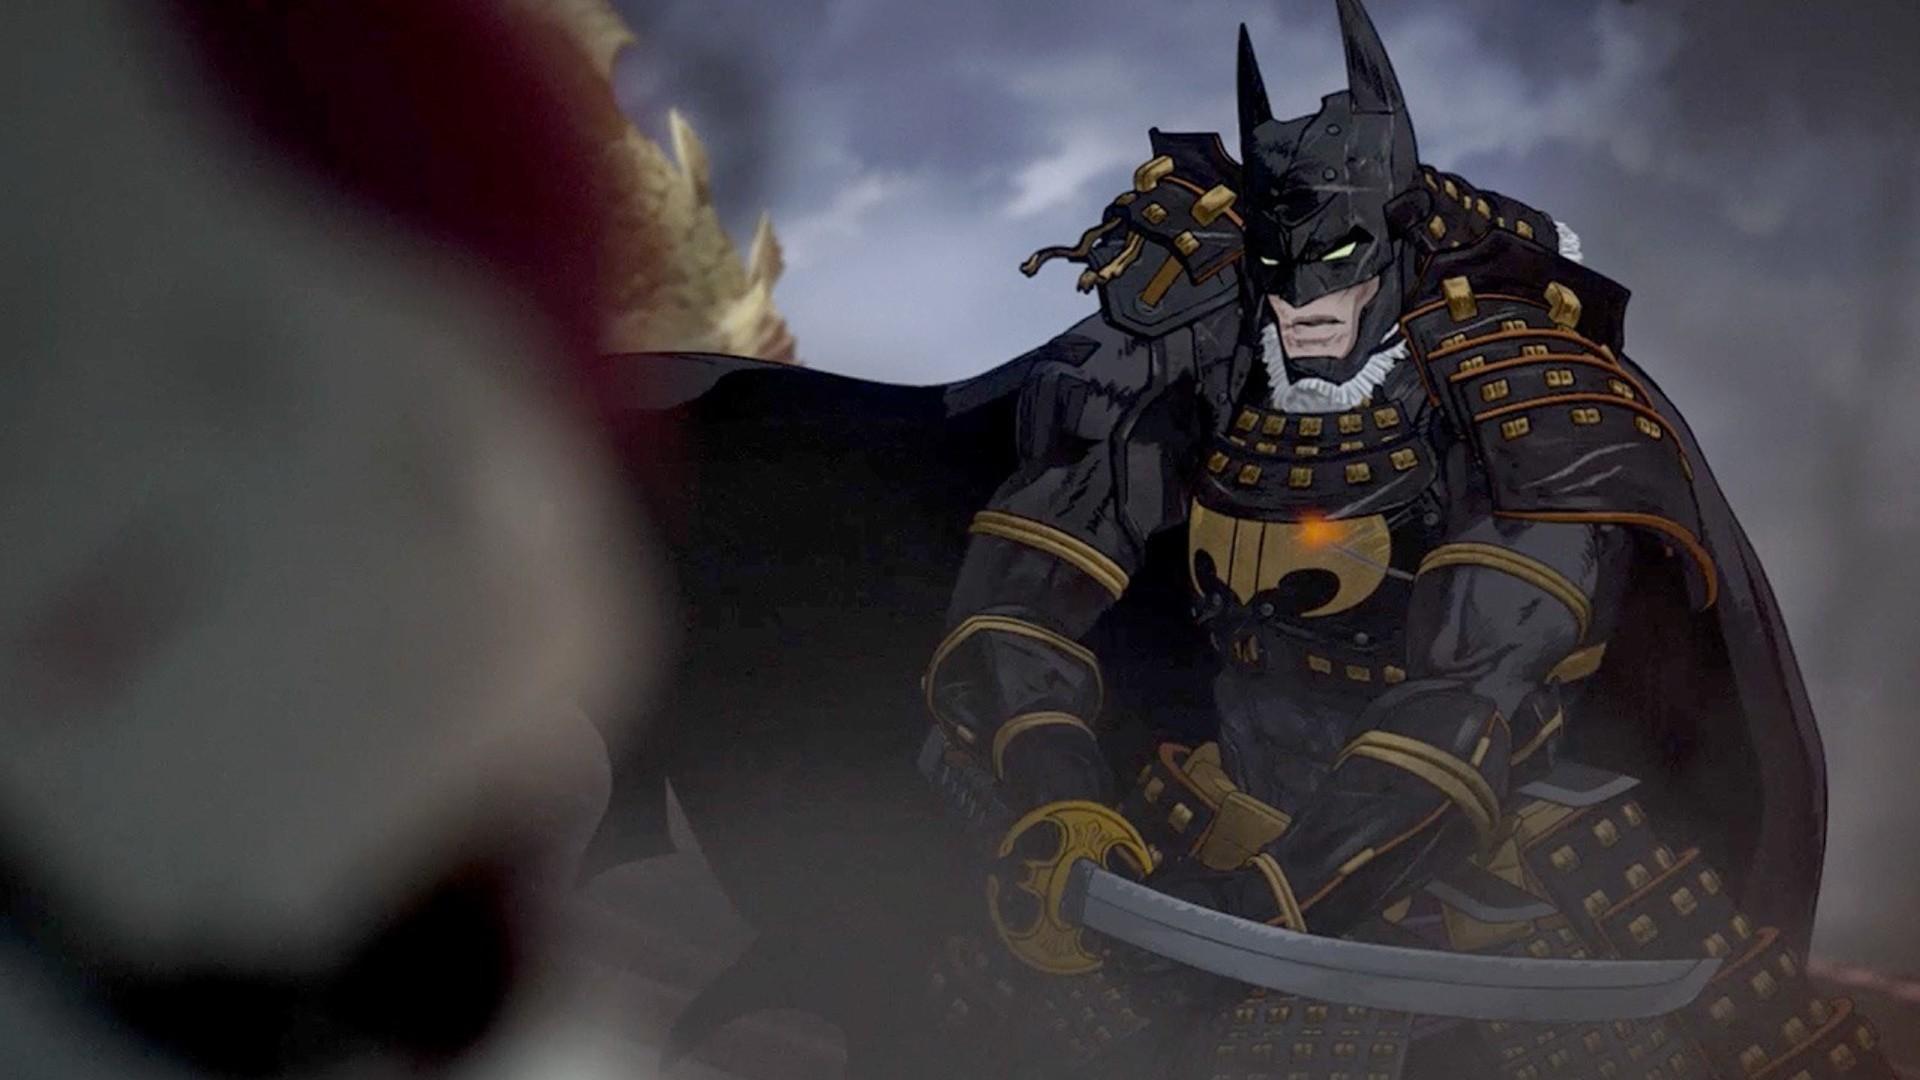 Batman Ninja Wallpaper Posted By Ethan Simpson